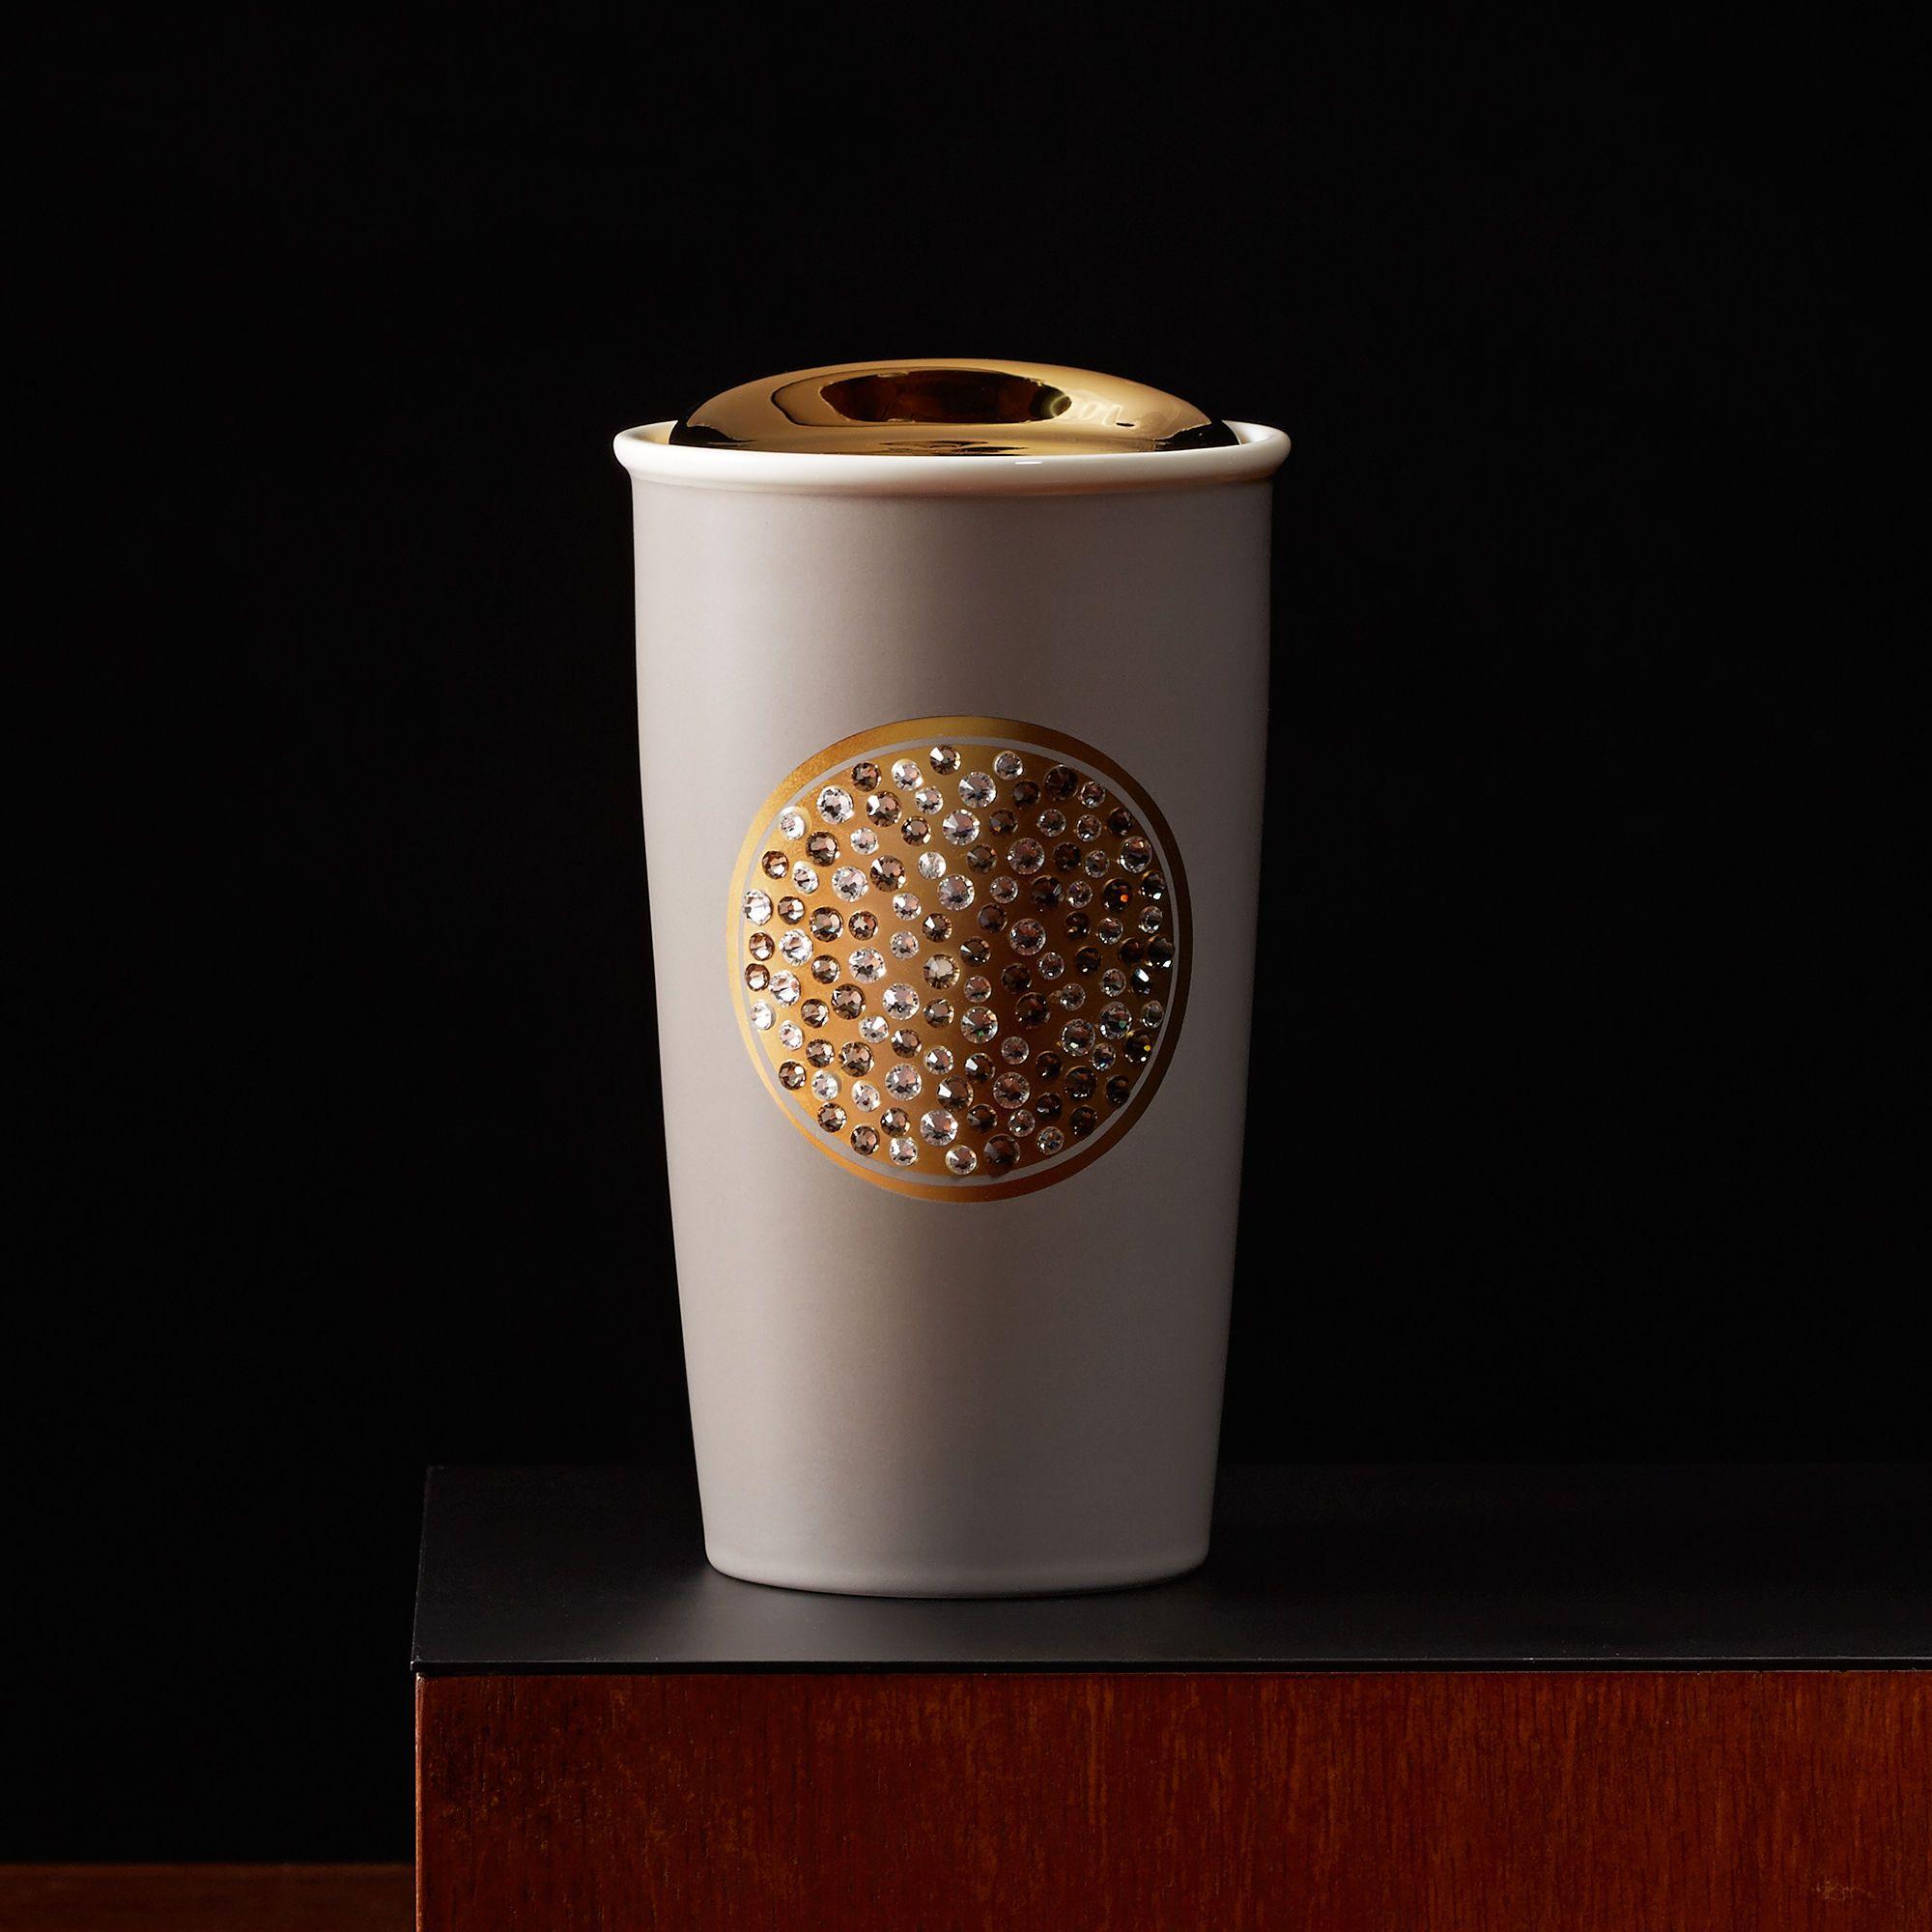 Starbucks 2105 Swarovski mug 52 Mugs, Starbucks mugs